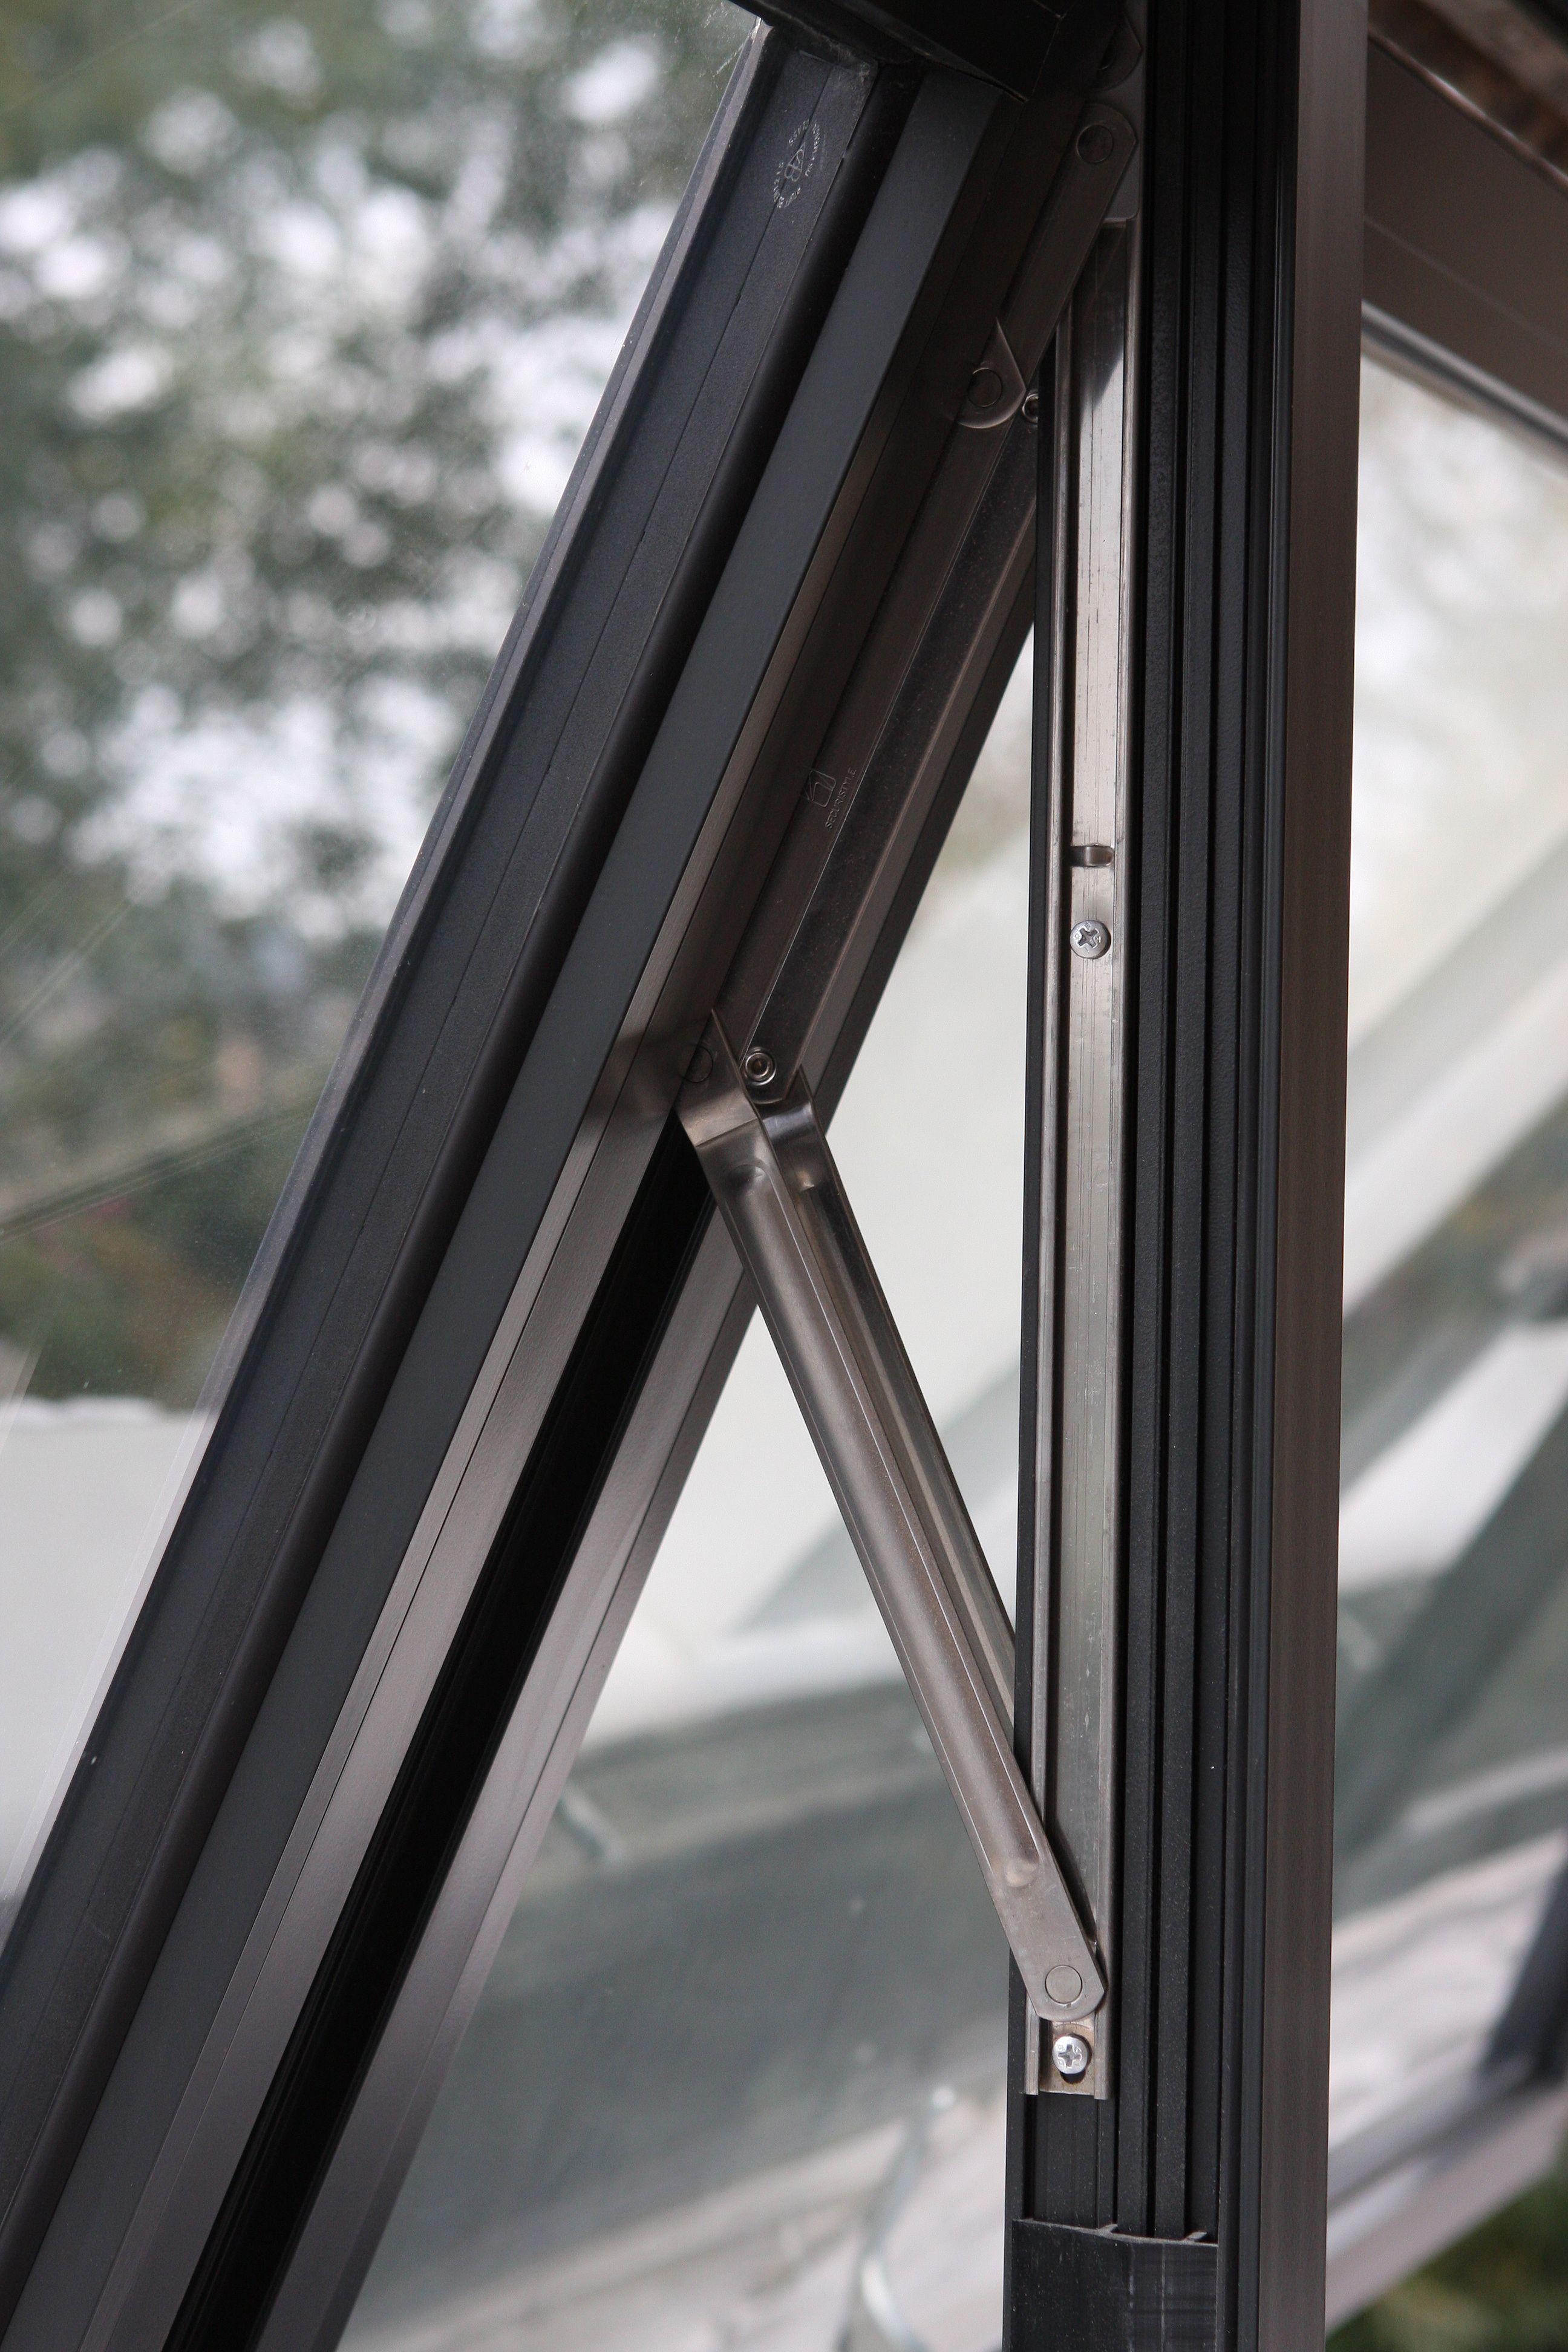 Contemporary aluminium casement windows installed onto